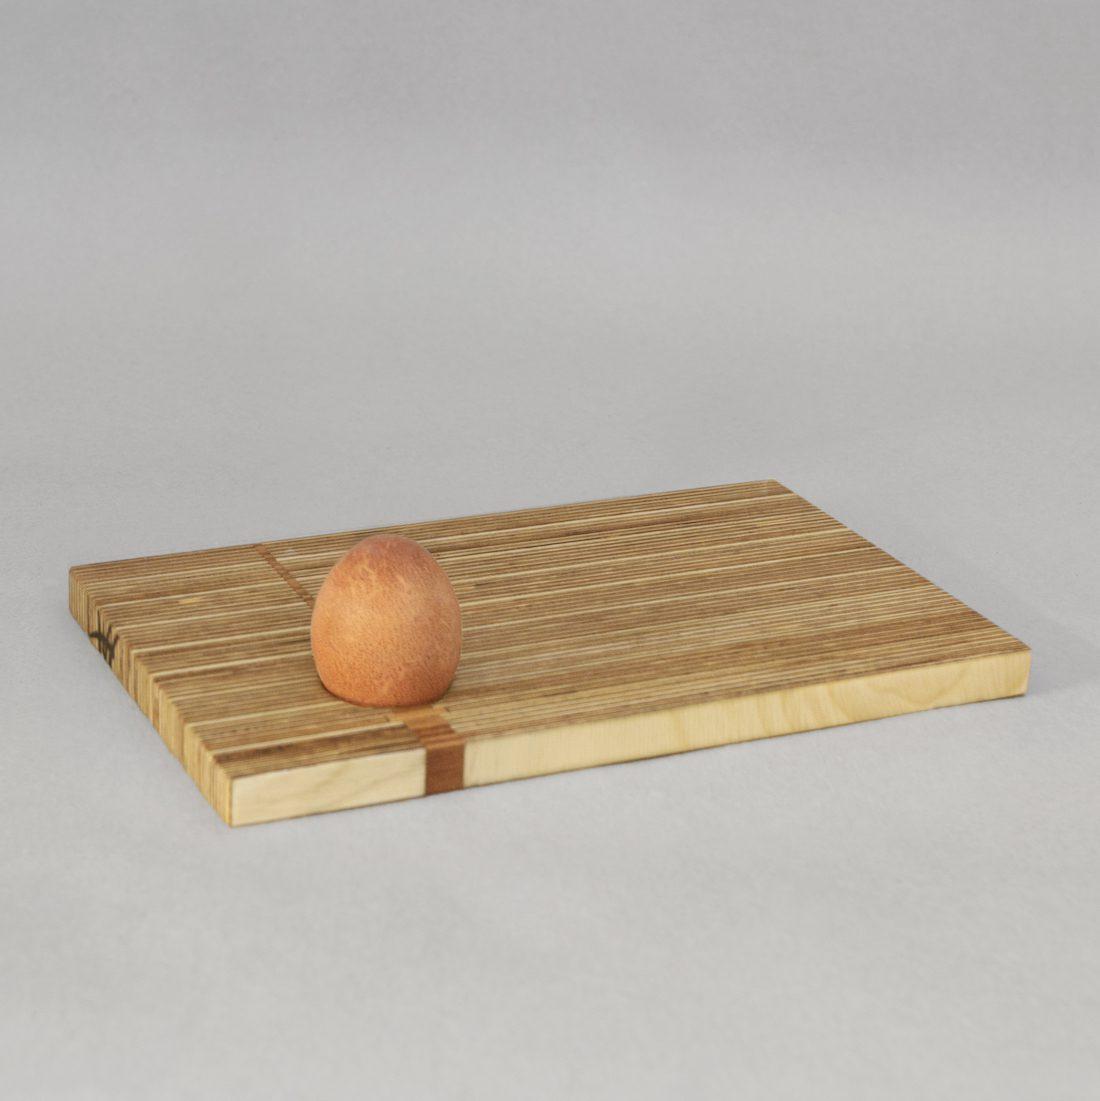 Henny Hendrichs, Frühstücksbrett mit Eierbecher